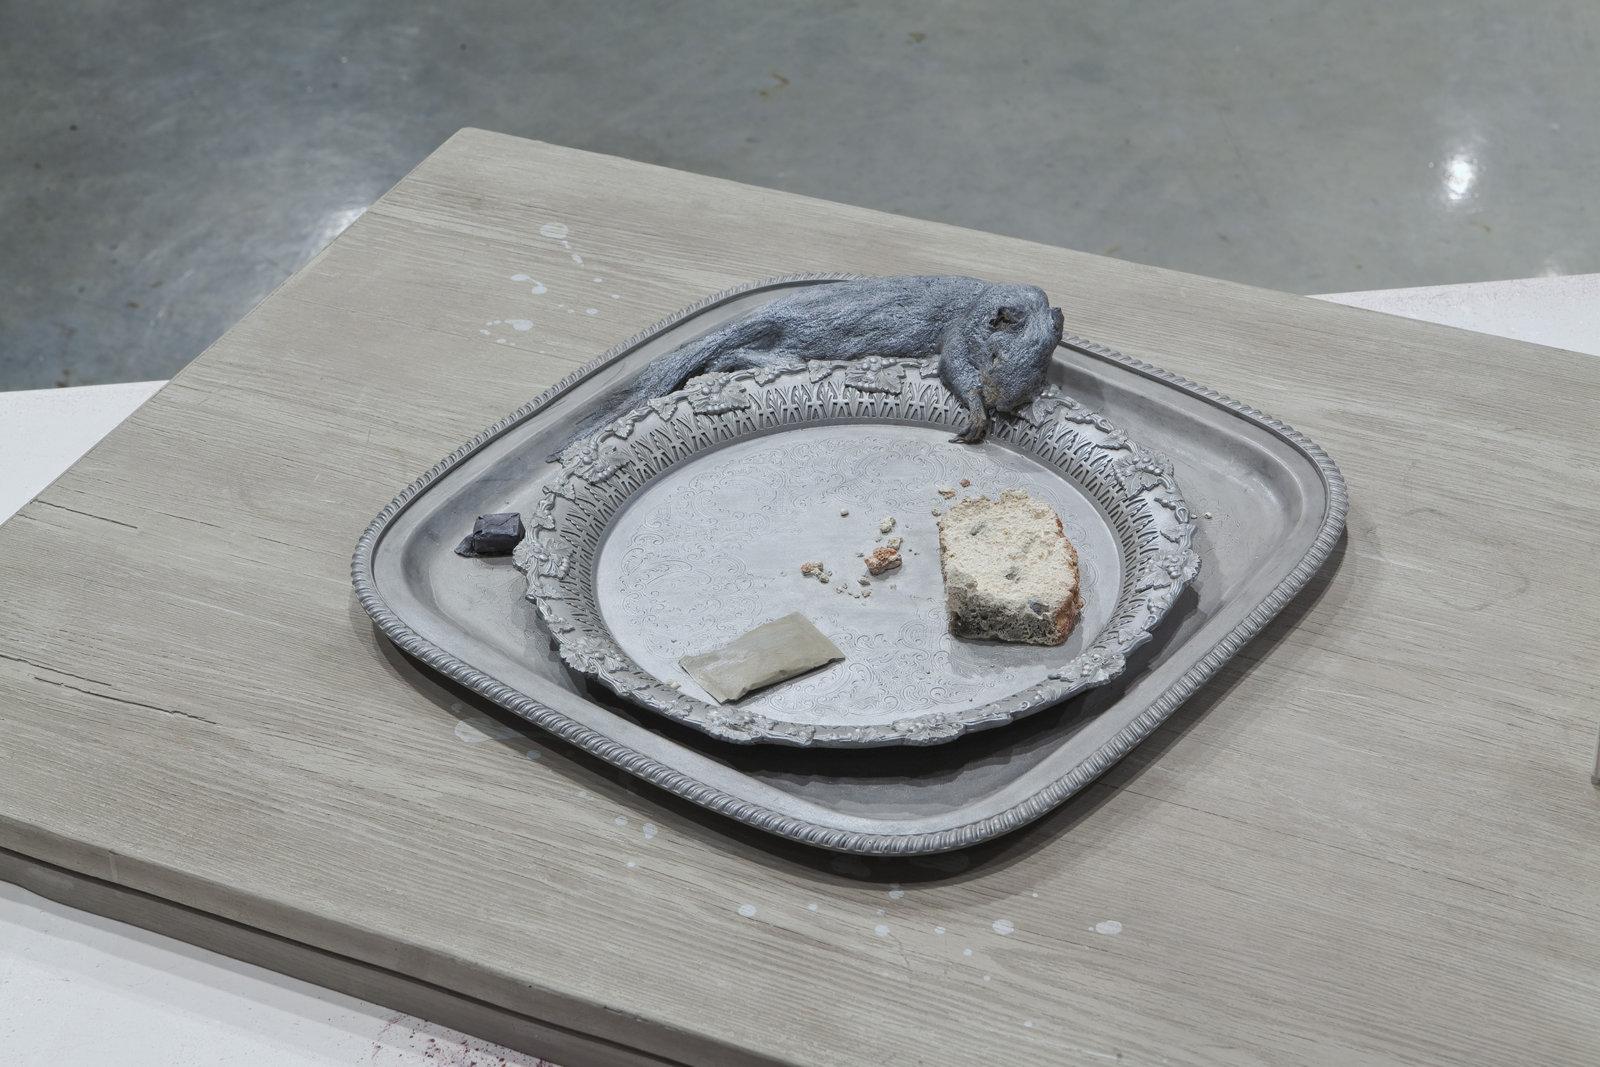 Liz Magor, Squirrel (cake), 2008, polymerized gypsum, 5 x 24 x 32 in. (13 x 61 x 81 cm) by Liz Magor